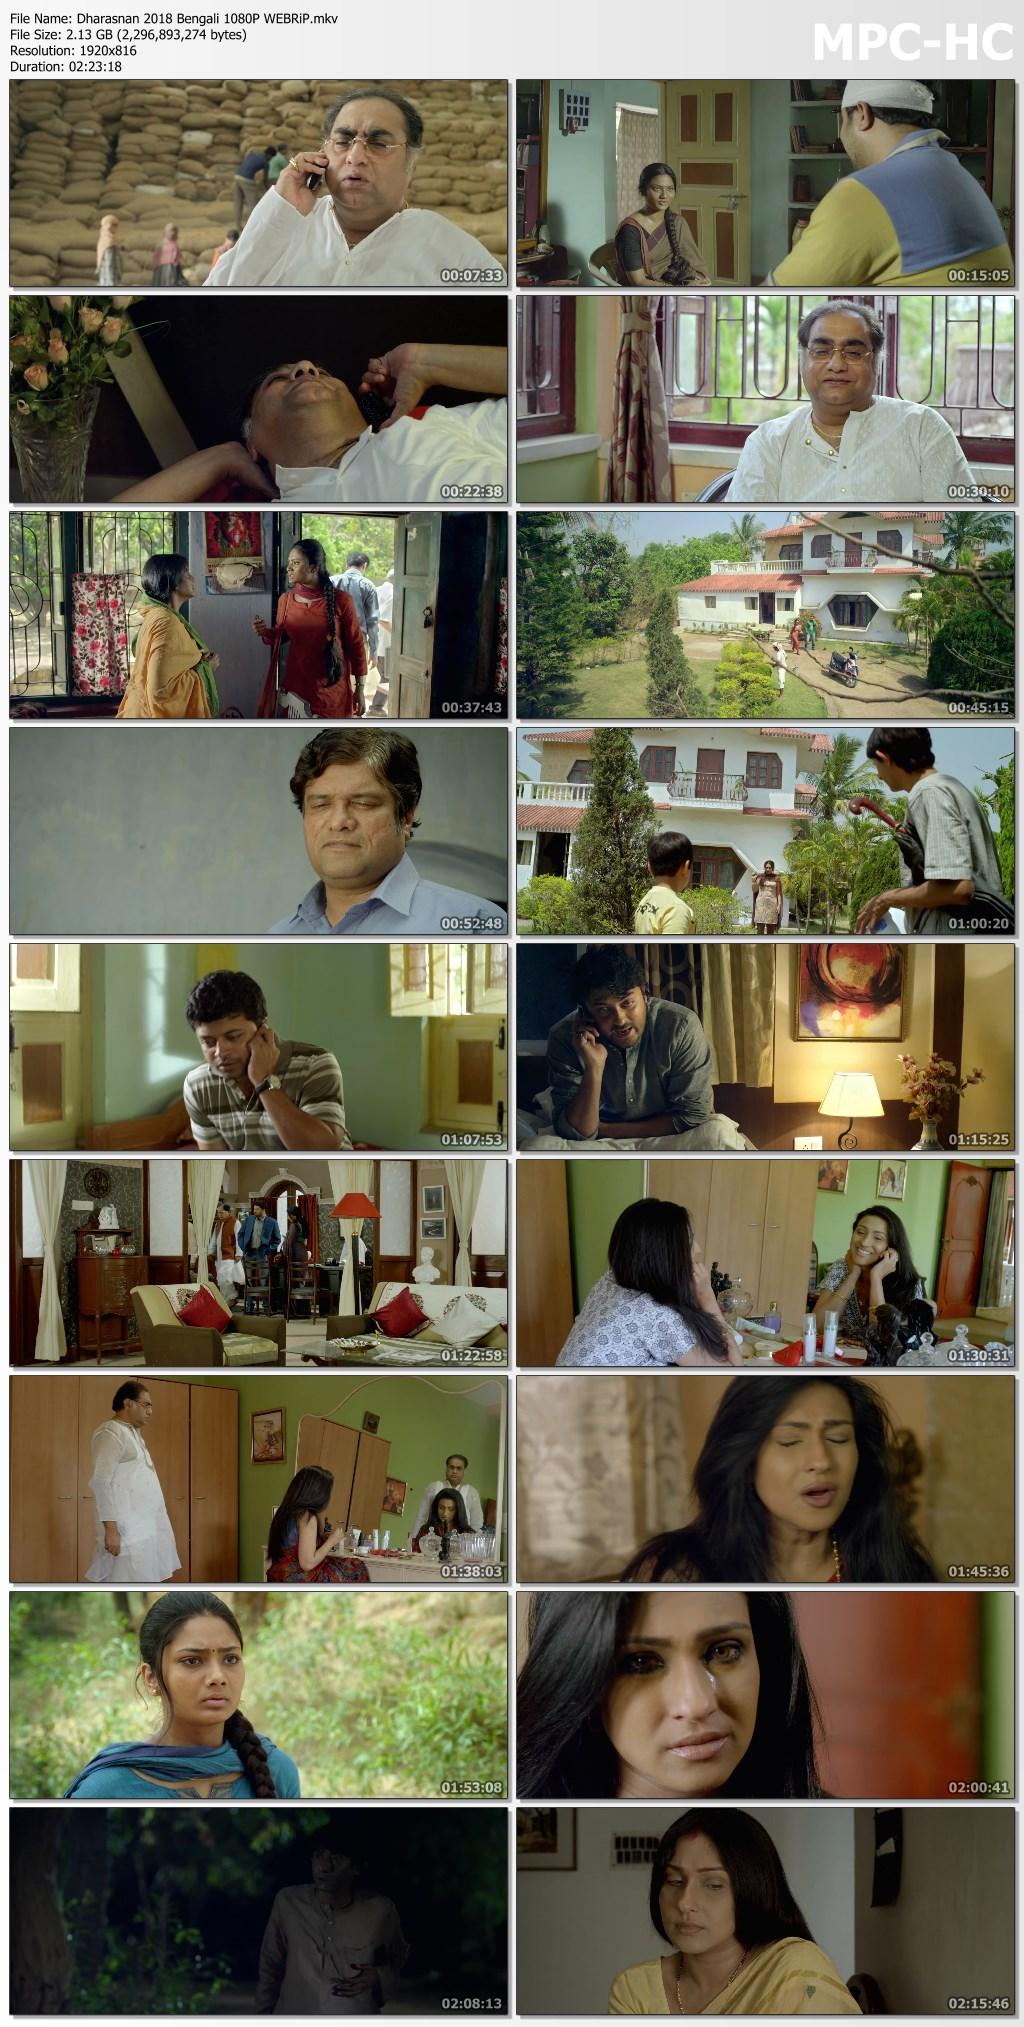 Dharasnan 2018 Bengali 1080P WEBRiP.mkv thumbs